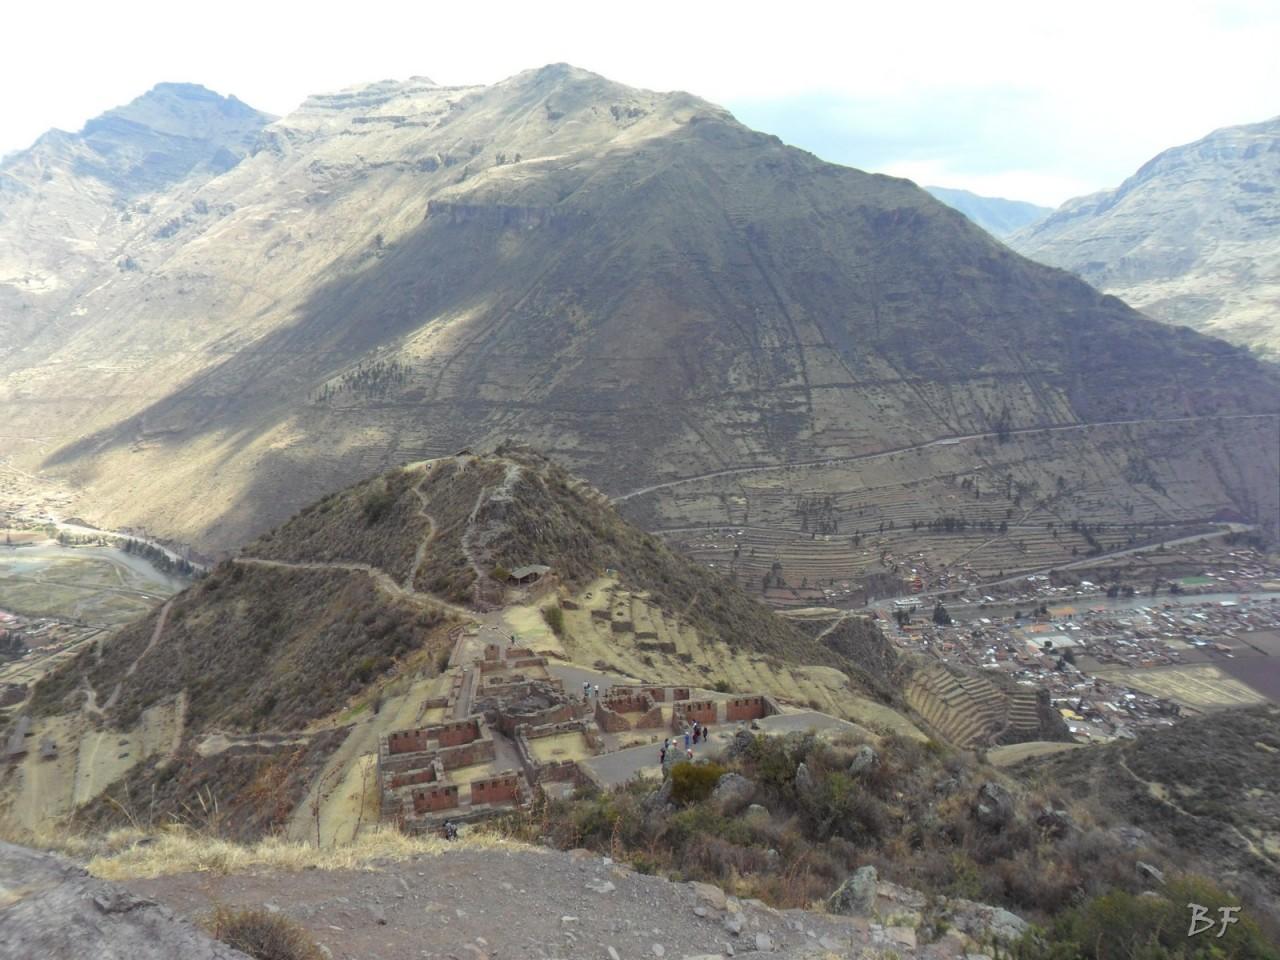 Mura-Poligonali-Megaliti-Altari-Rupestri-Pisac-Cusco-Perù-37